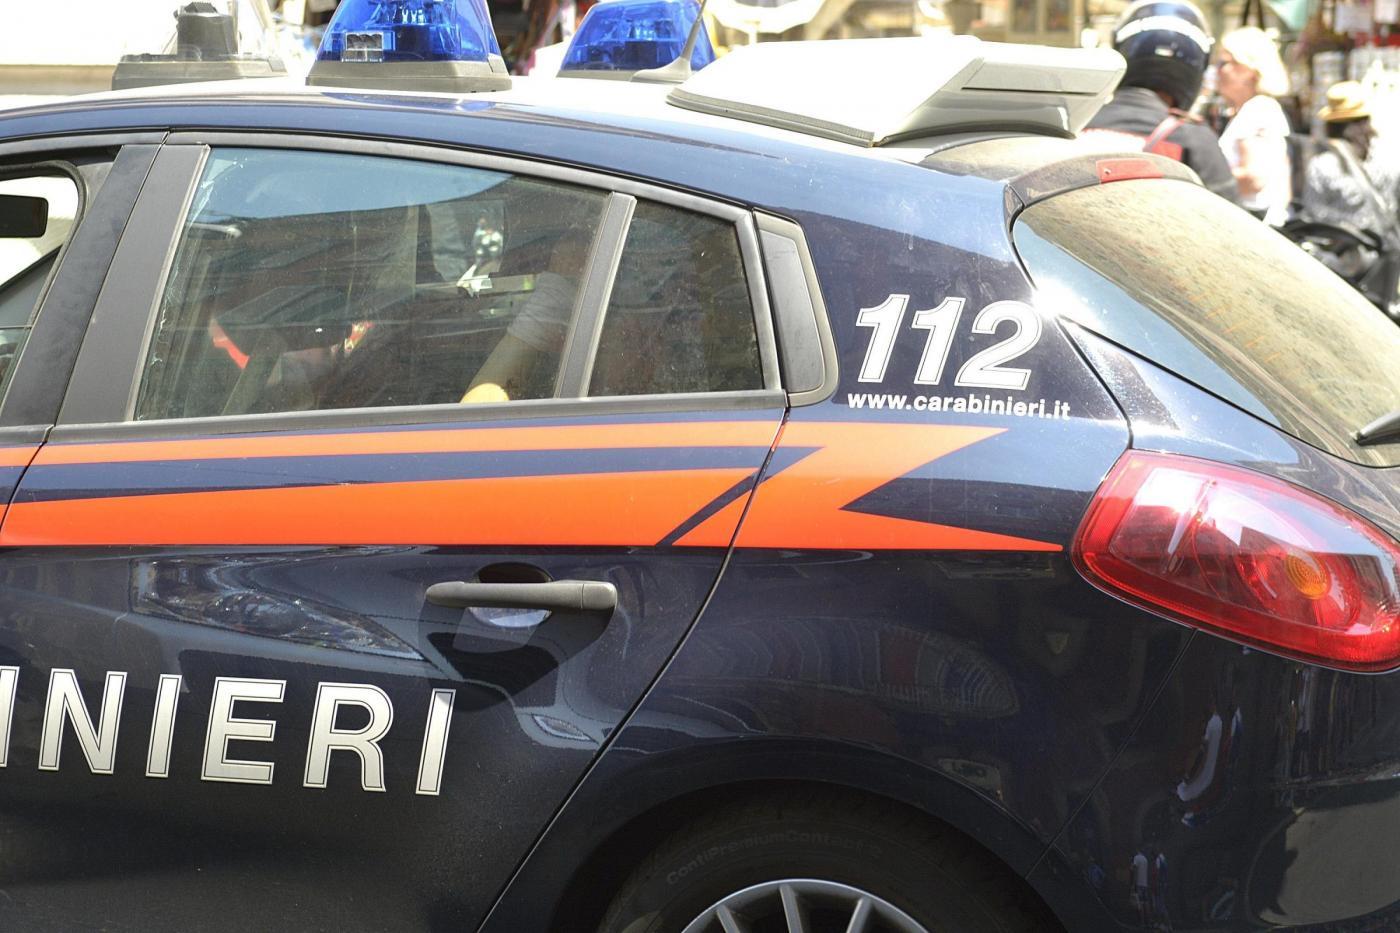 Camorra, arrestato l'ex vice sindaco di Caserta